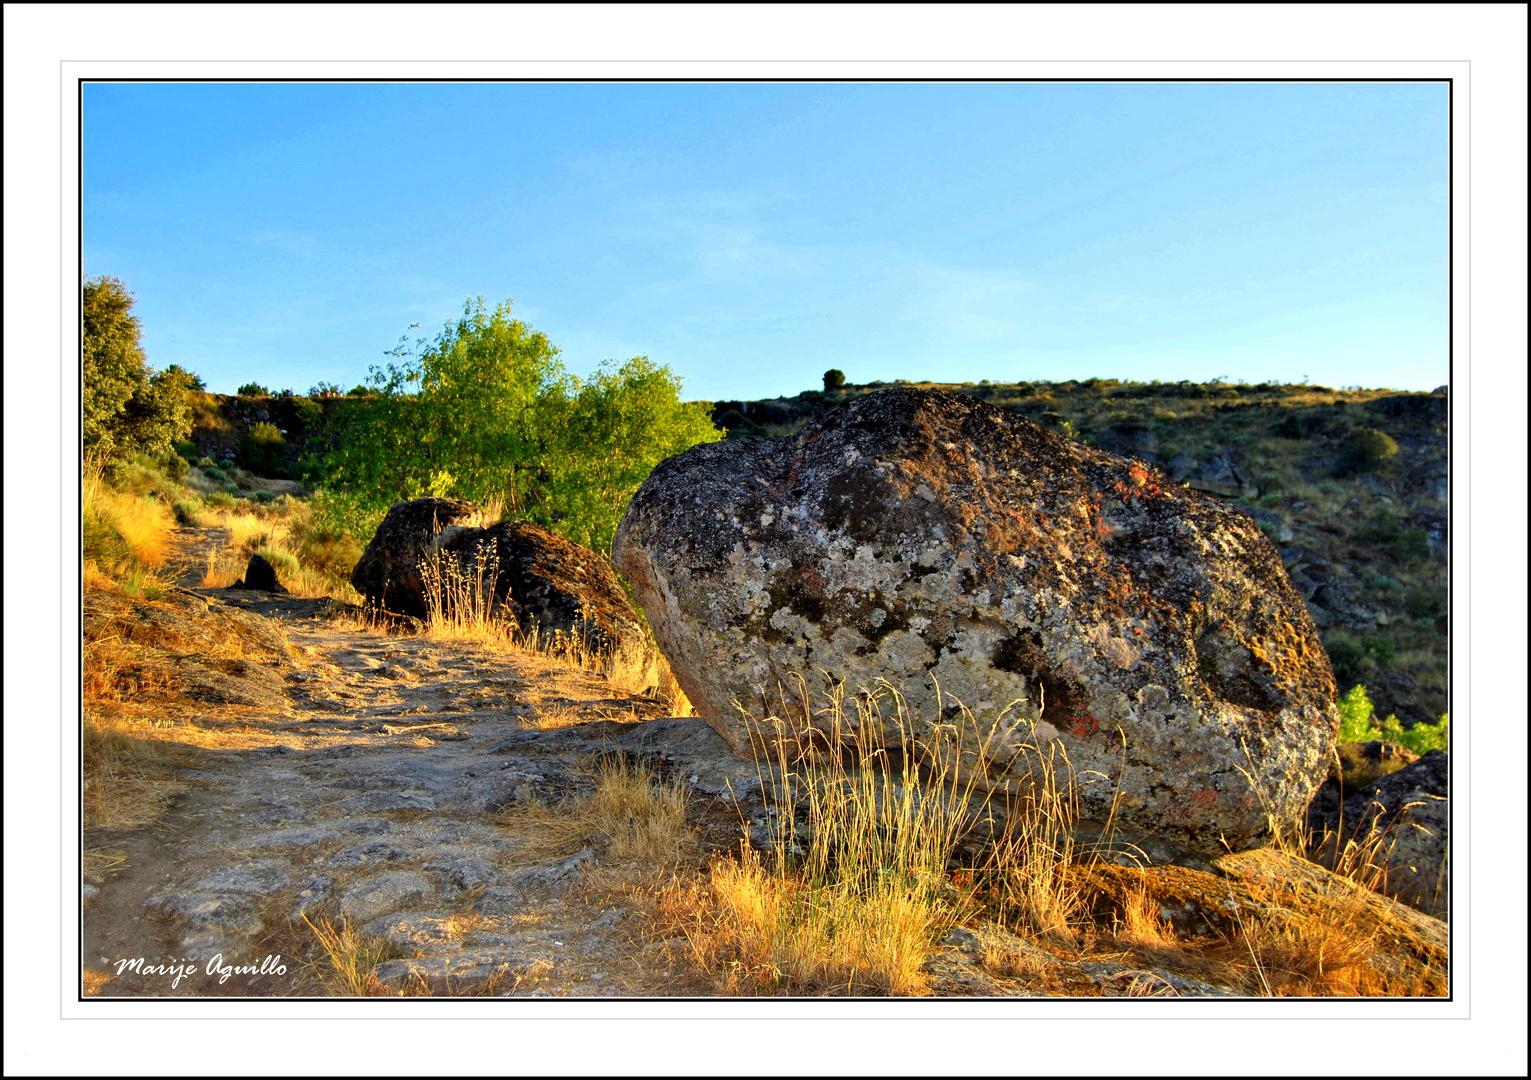 Atardecer en paisaje granítico